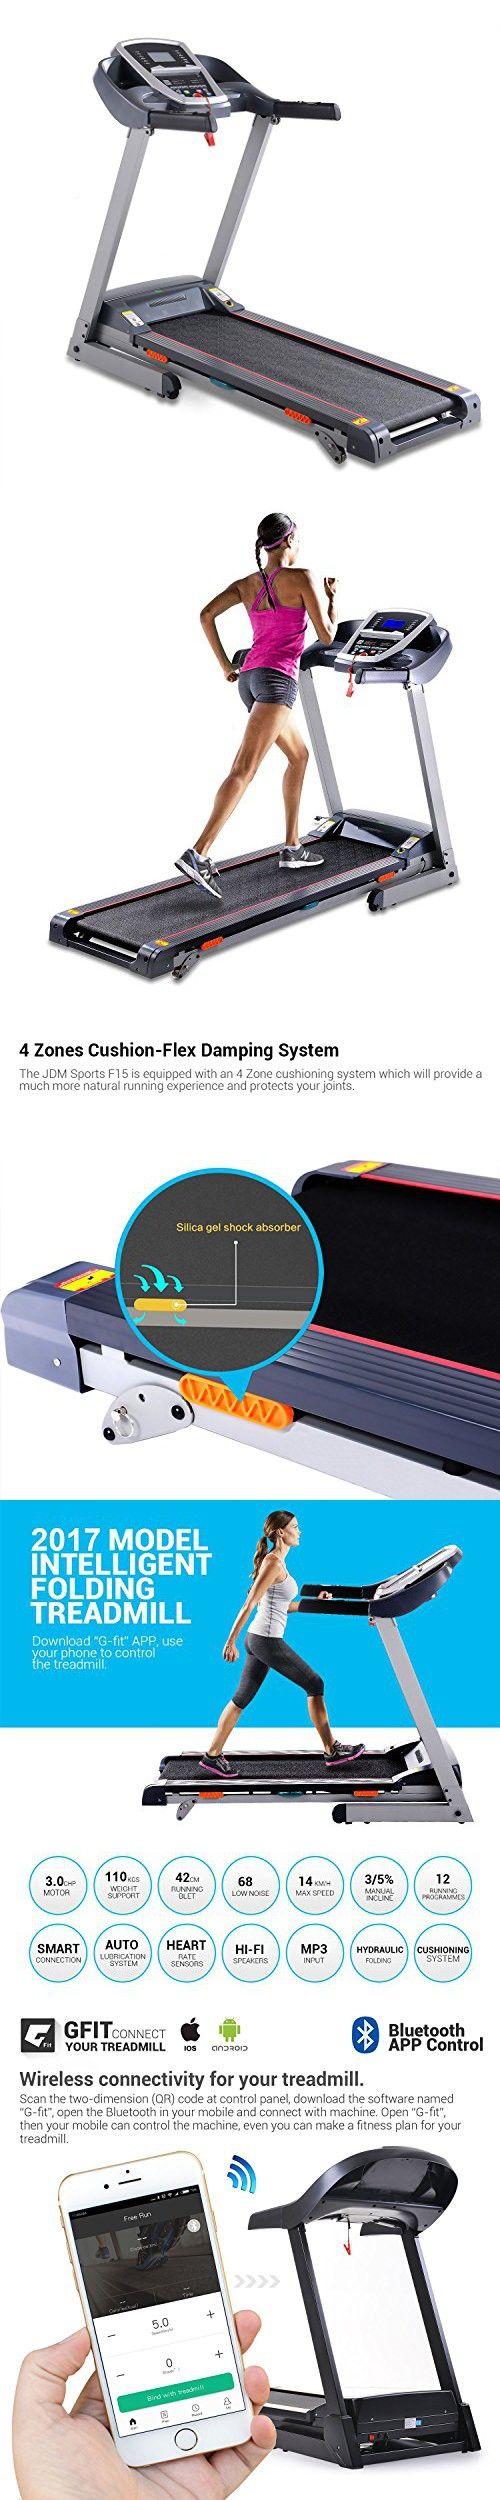 Garain S8100 Folding Electric Treadmill Motorized Power Treadmill Portable Running Gym Fitness Machine with Bluetooth Control (US STOCK)